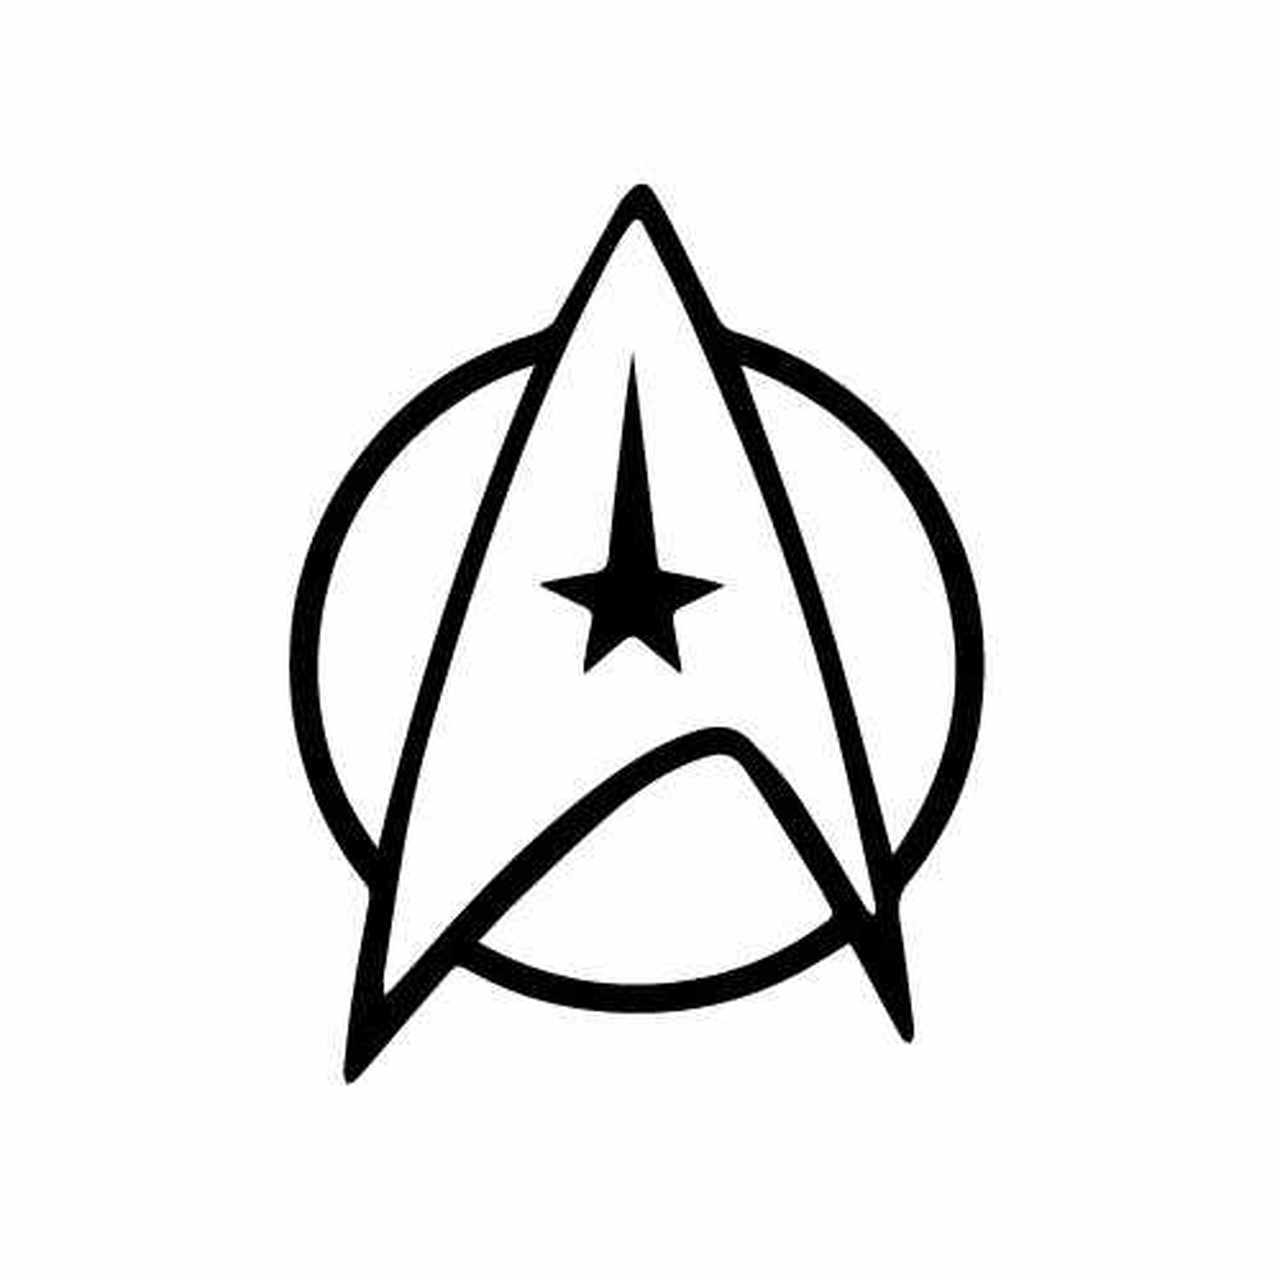 Star-Trek-Logo-Vinyl-Decal-Sticker__29045.1497016892.jpg Download free STL file Star Trek logo on a leather jacket • 3D printer design, FiveNights